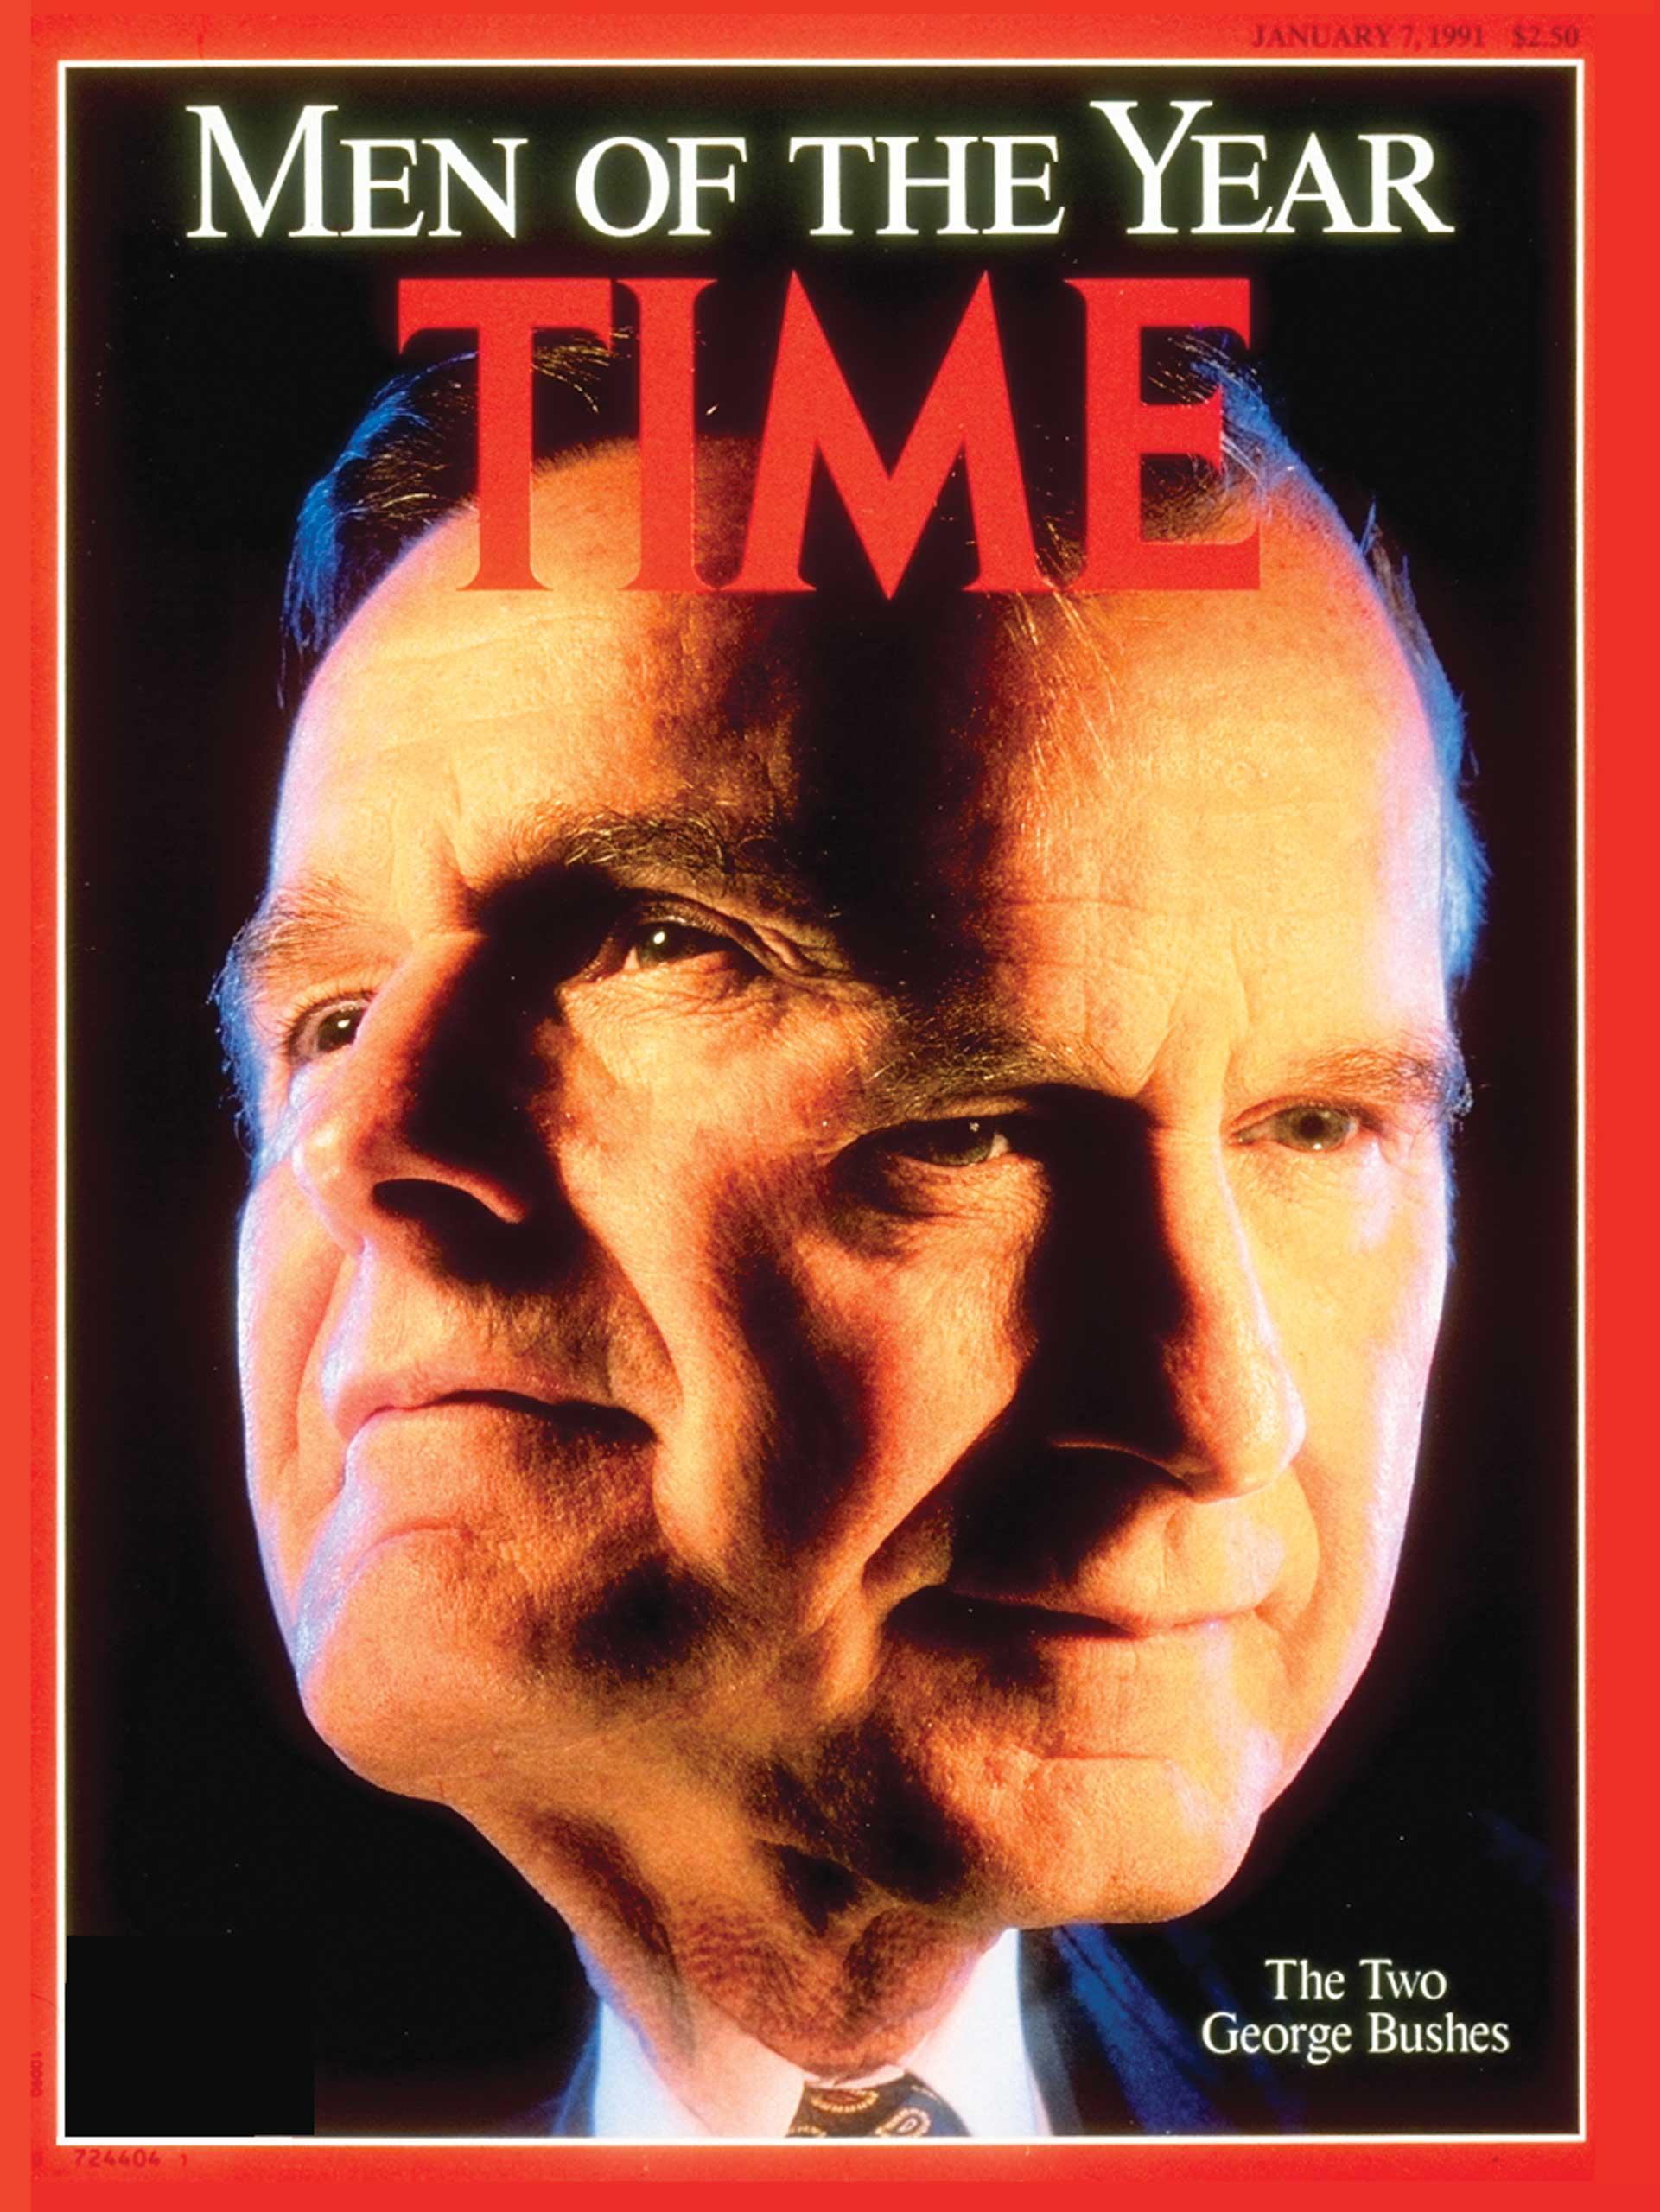 1990: President George H.W. Bush